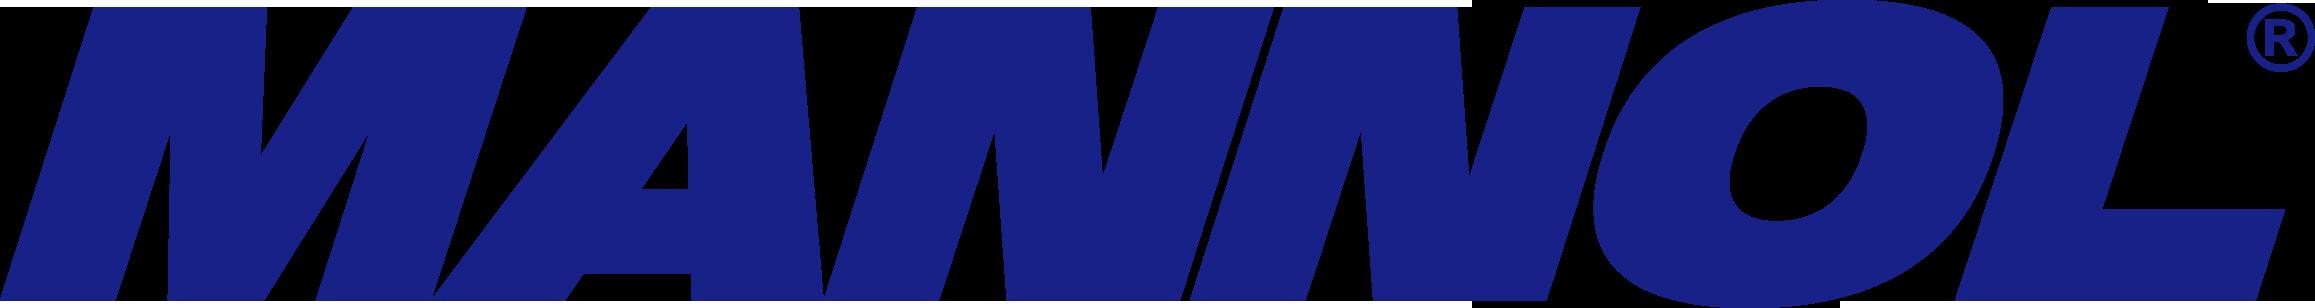 2017-03-08